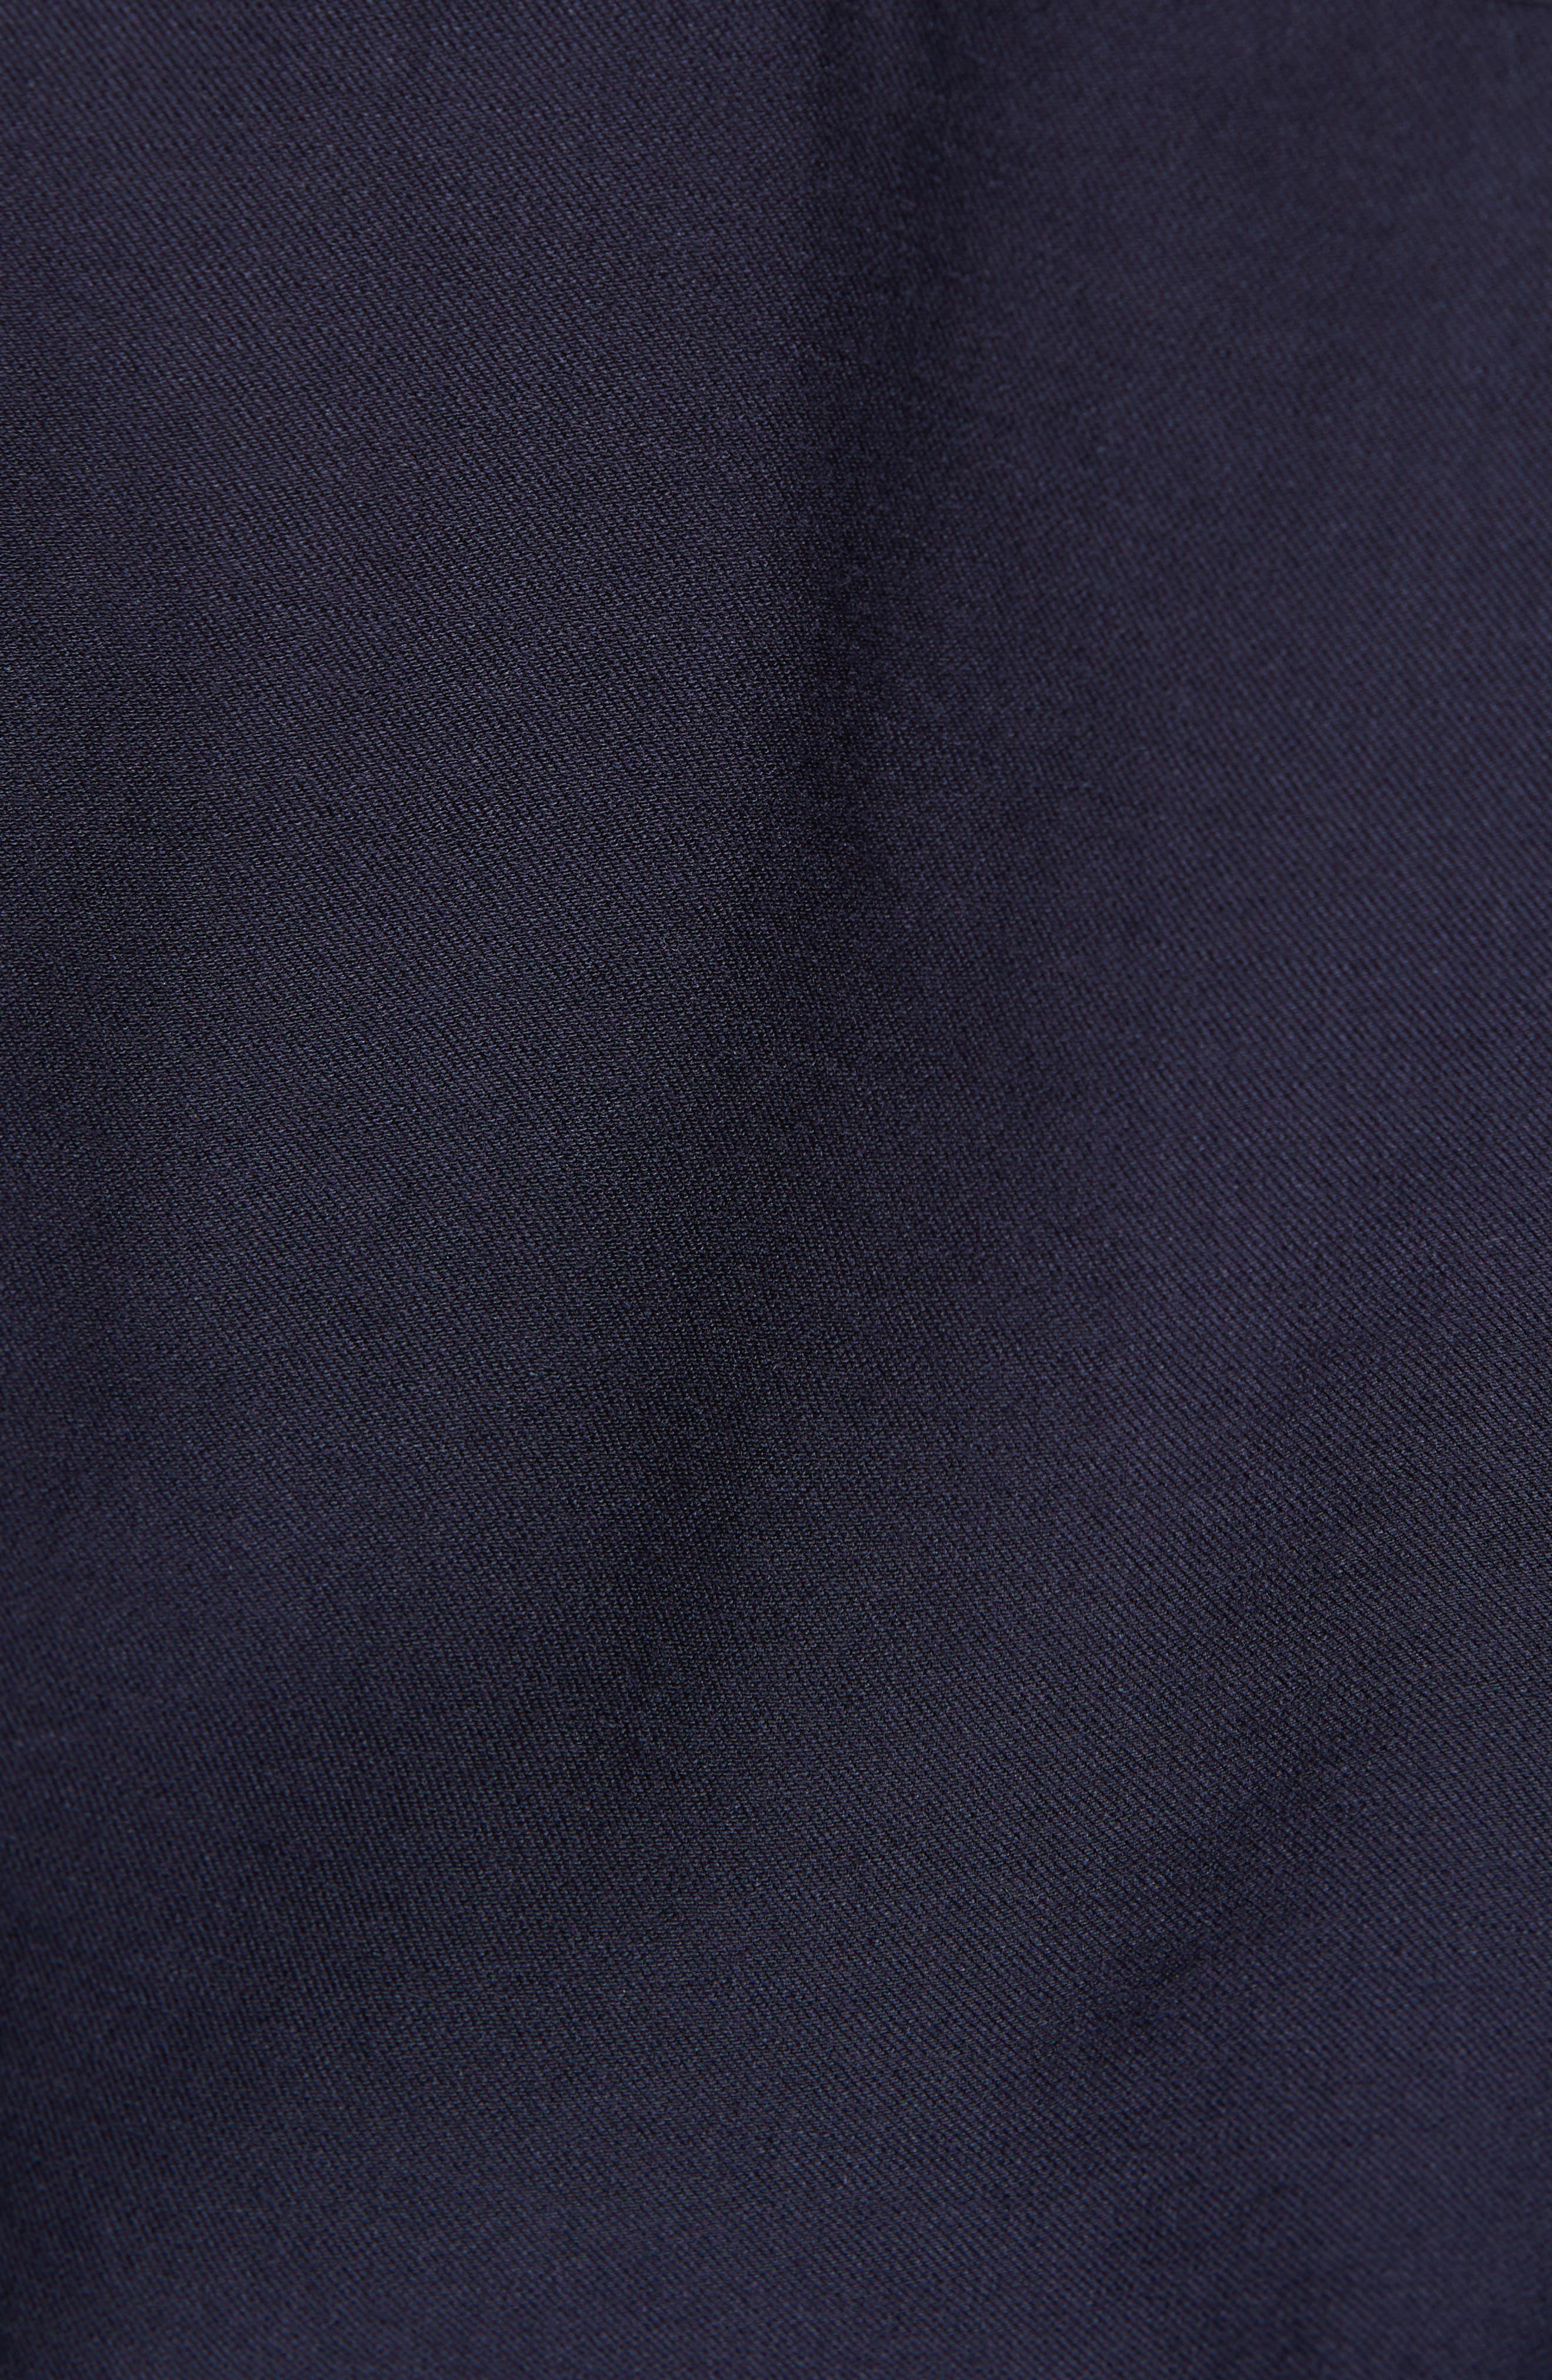 VINCE, Utility Shirtdress, Alternate thumbnail 5, color, MARINE